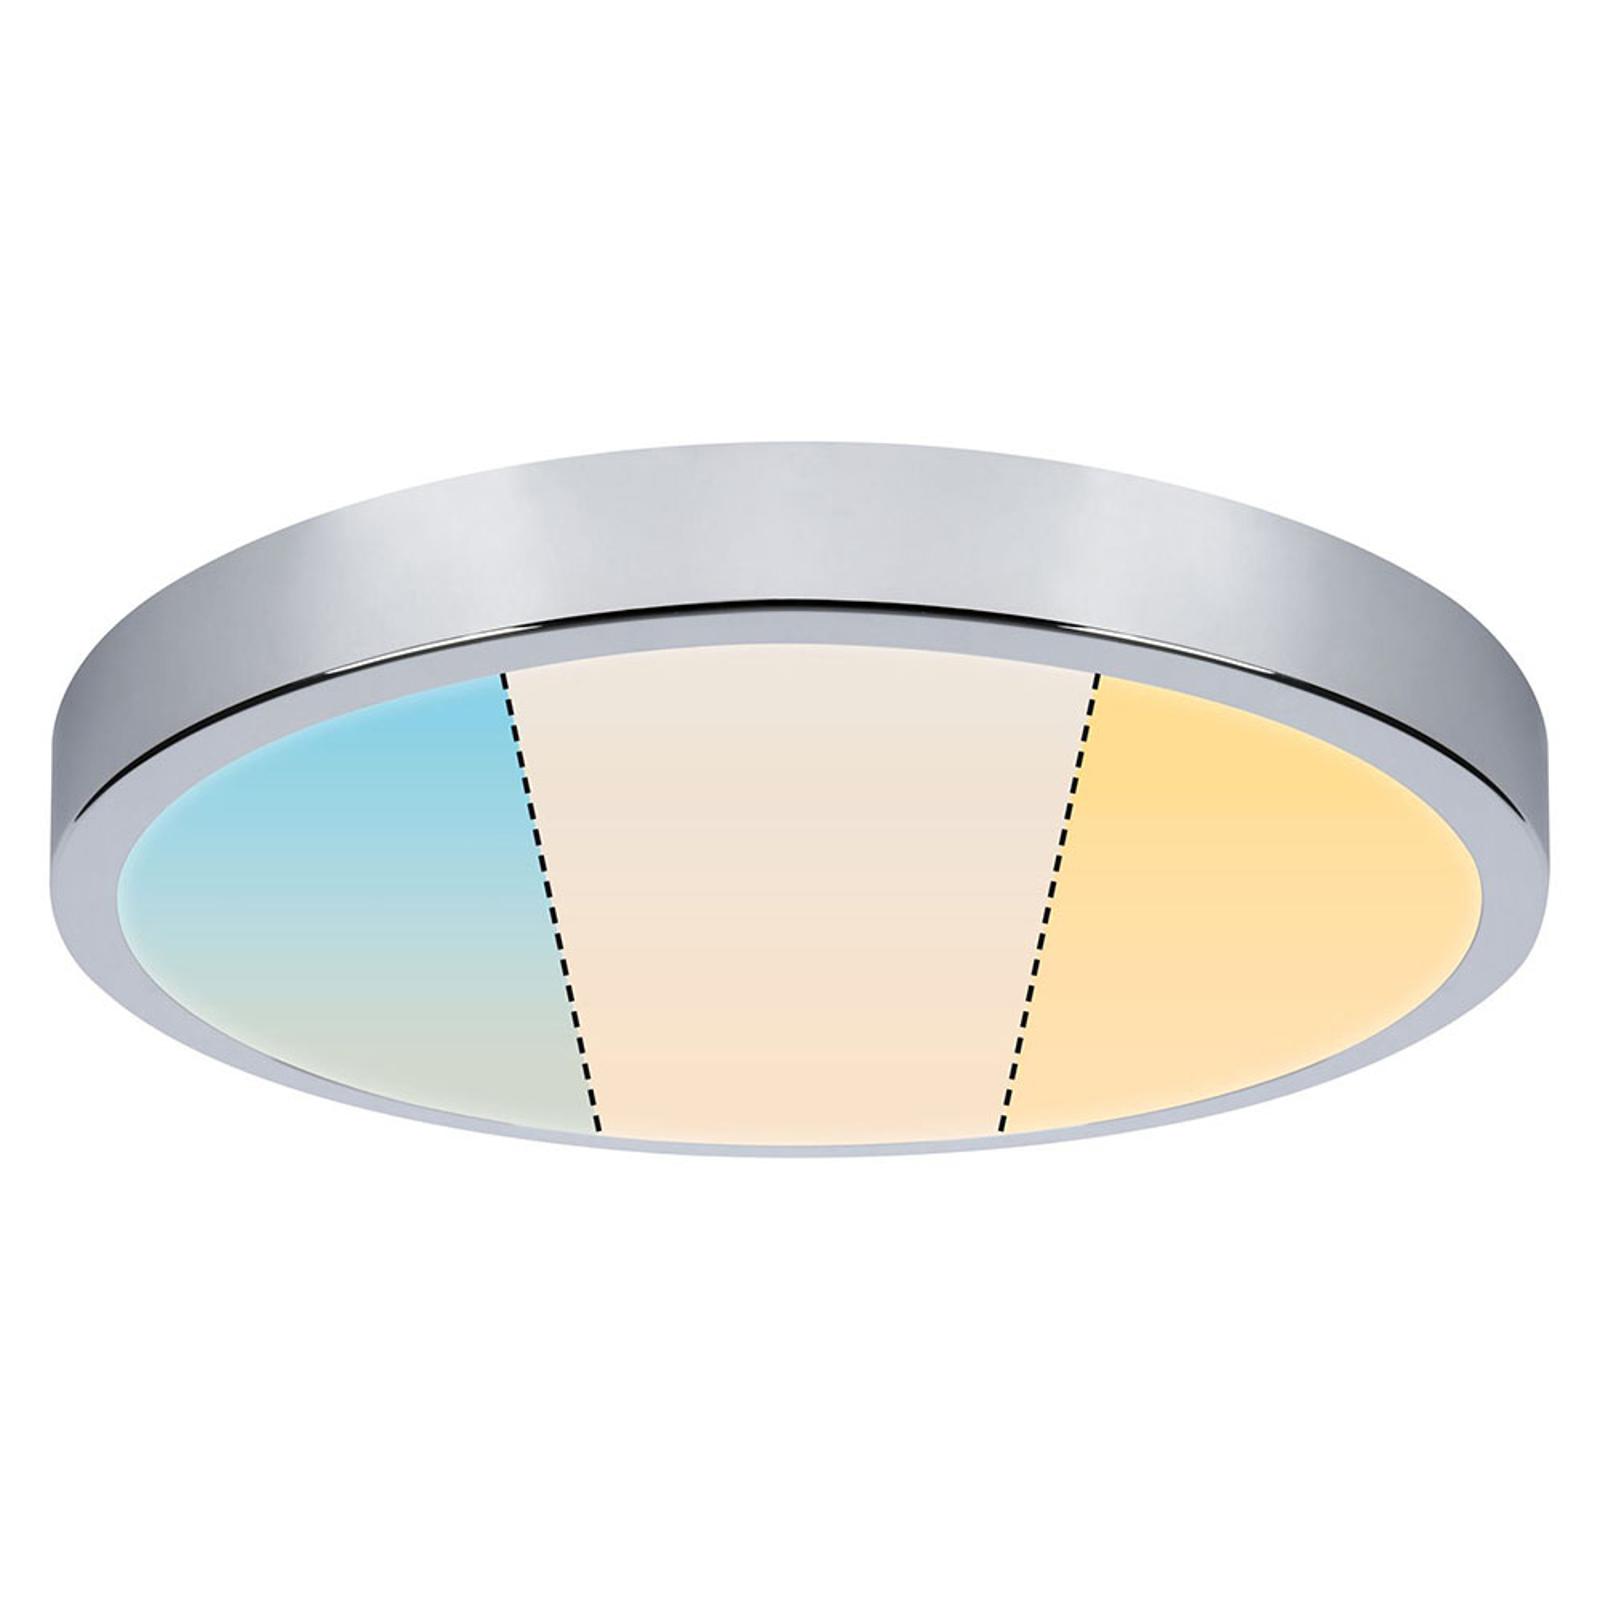 Dove acquistare Paulmann Aviar plafoniera LED WhiteSwitch Ø 36cm